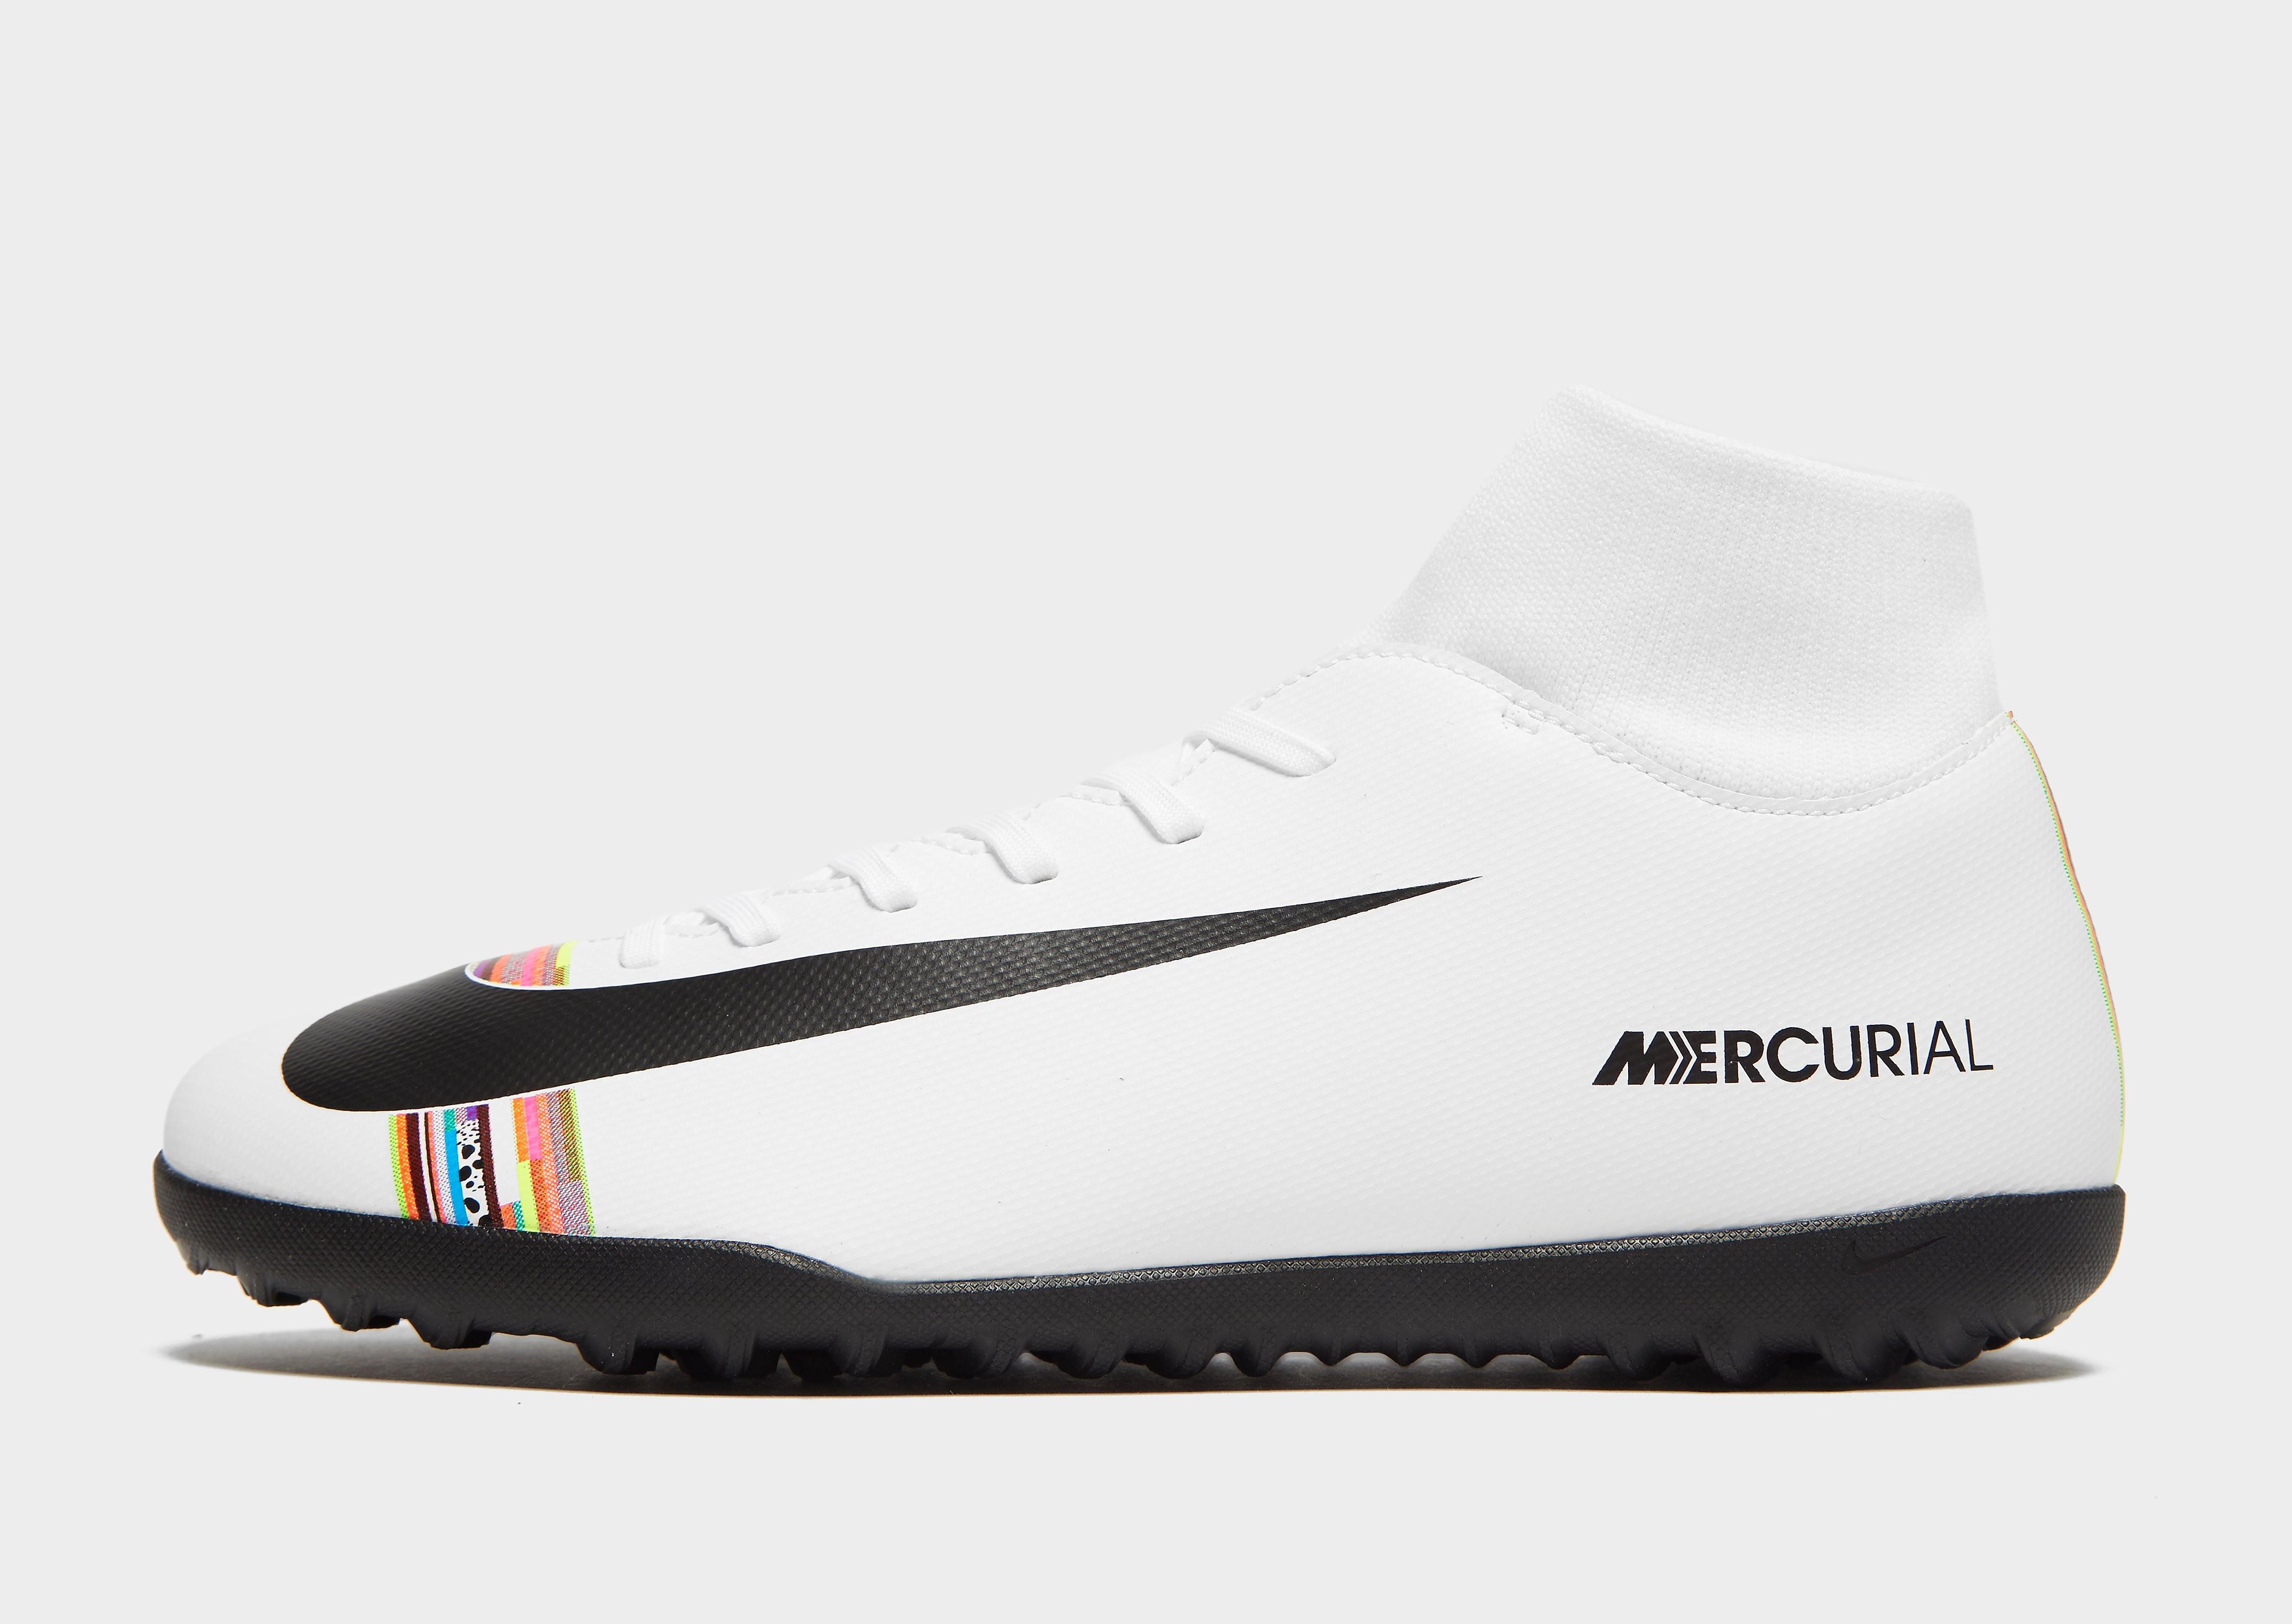 sports shoes 9b3ed d03c1 Bild på Nike LVL Up Mercurial Superfly 6 Club TF Herr, Vit